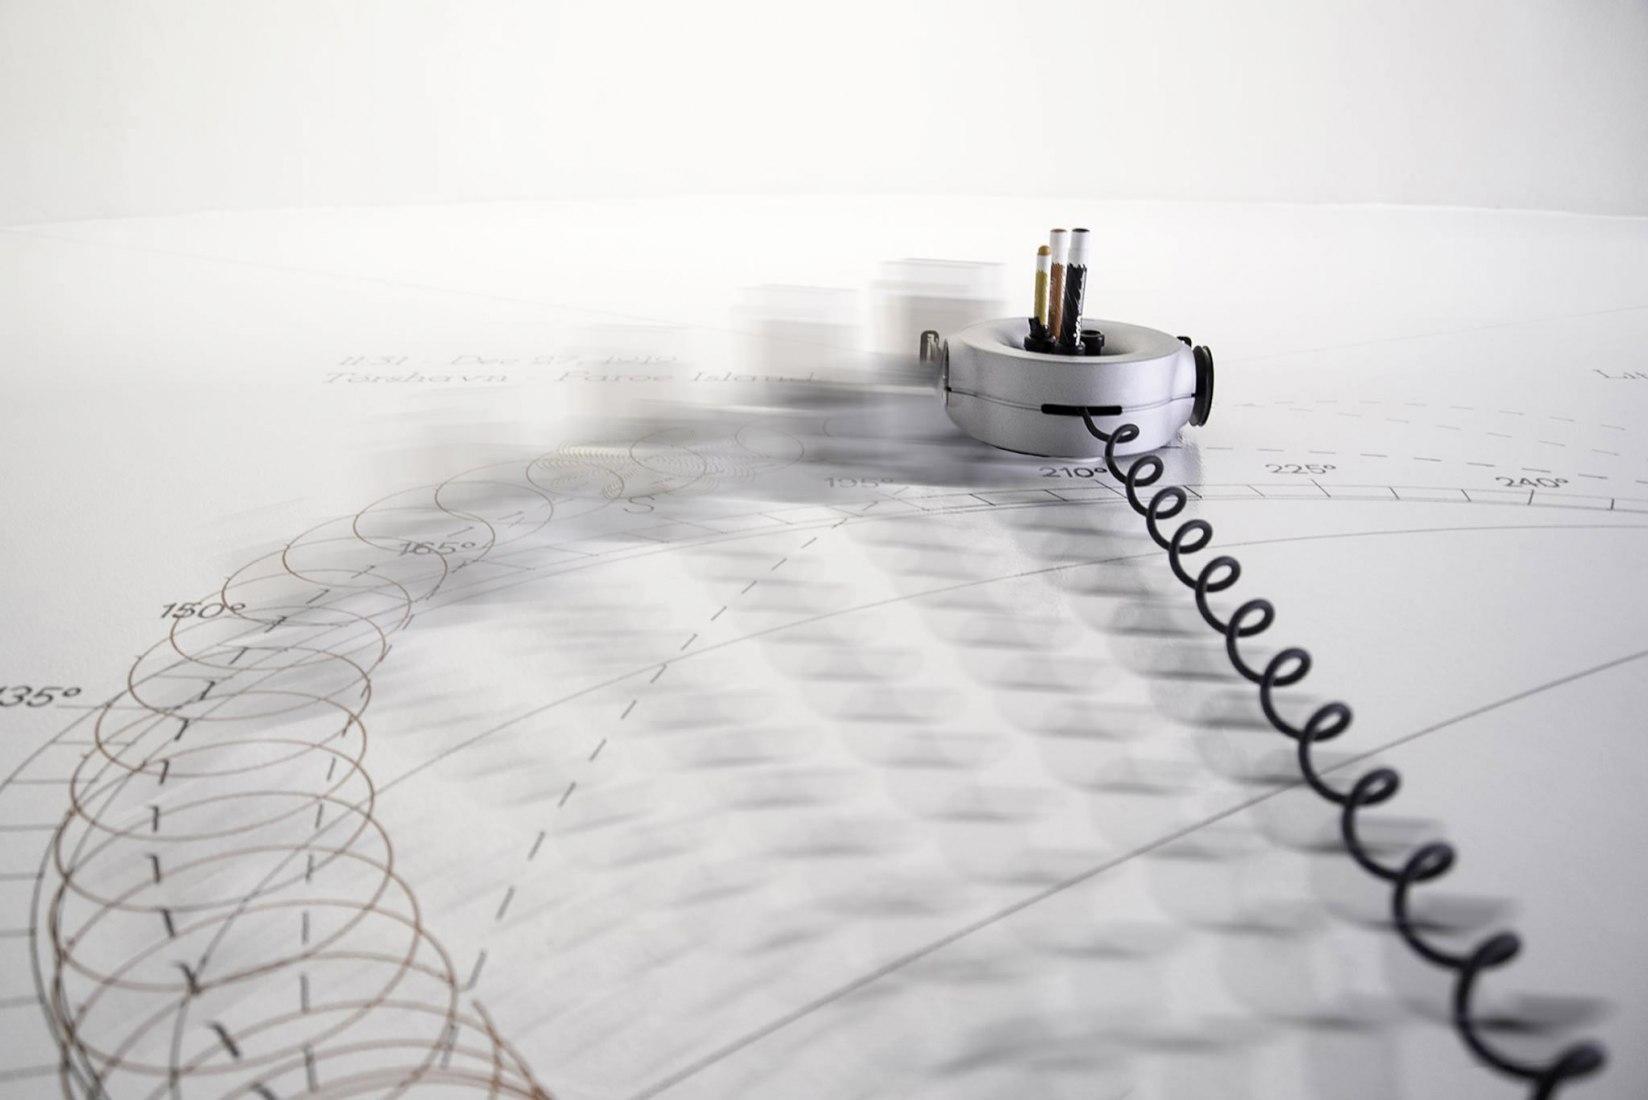 Olafur Eliasson's LittleSun and Carlo Ratti's Scribit robot. Photograph by Federico Morando